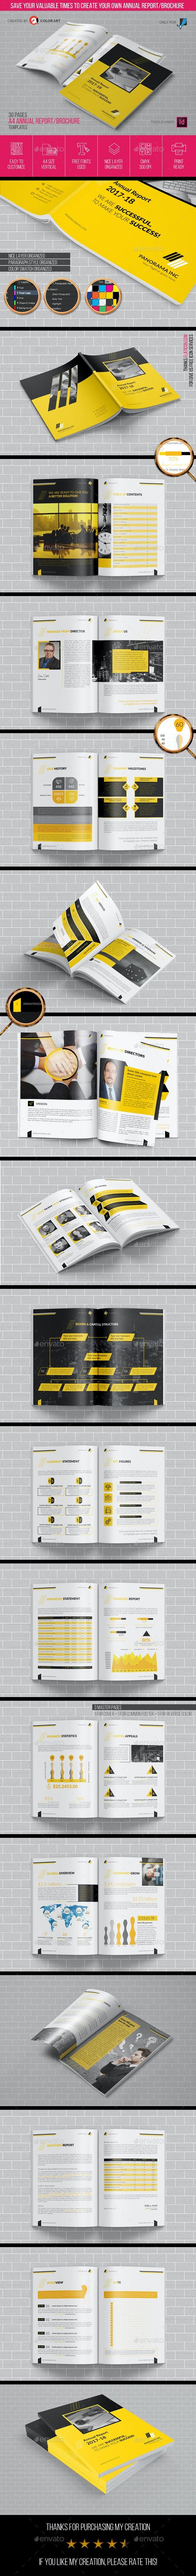 Annual Report Brochure Template 2018 - Brochures Print Templates